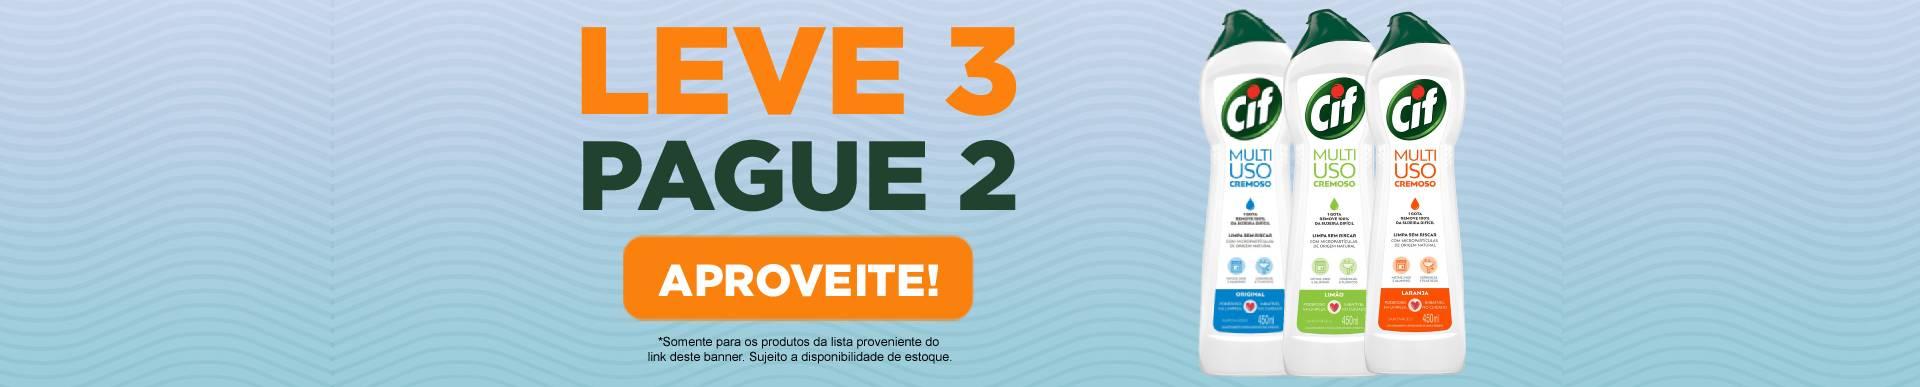 Unilever-Cif-L3P2